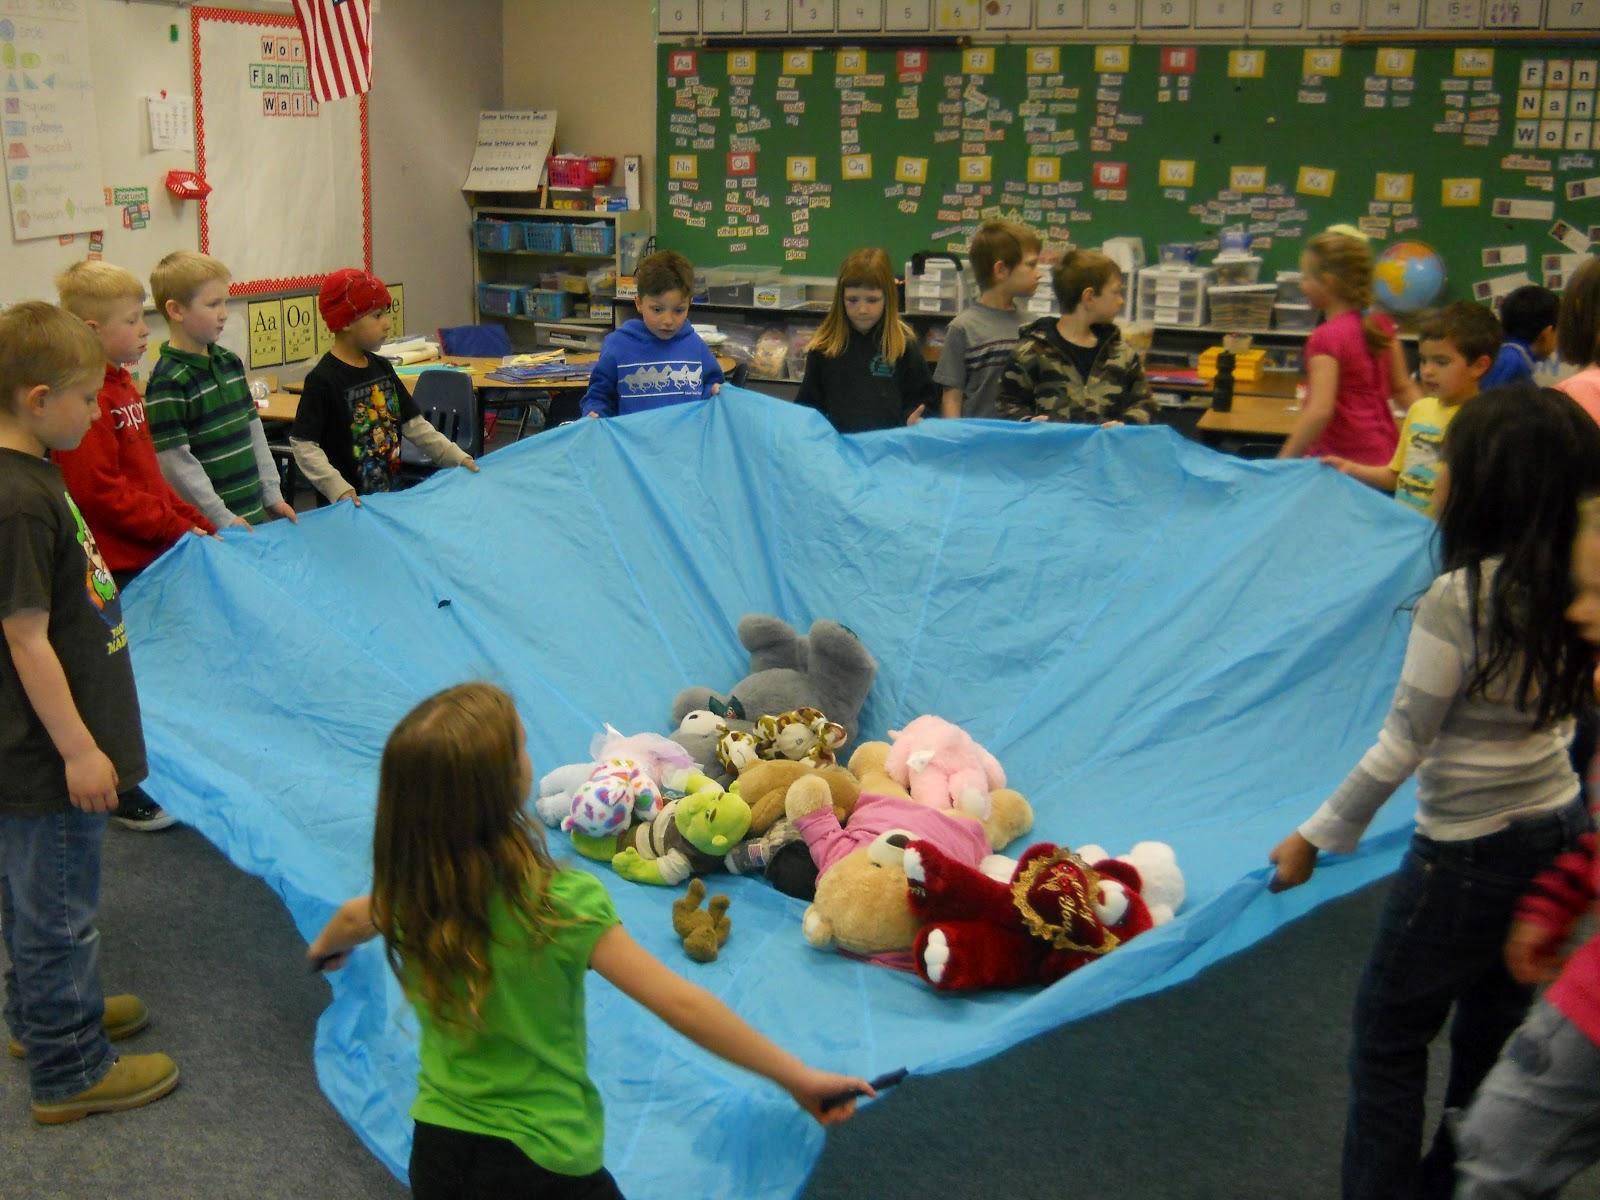 Teddy bear picnic games